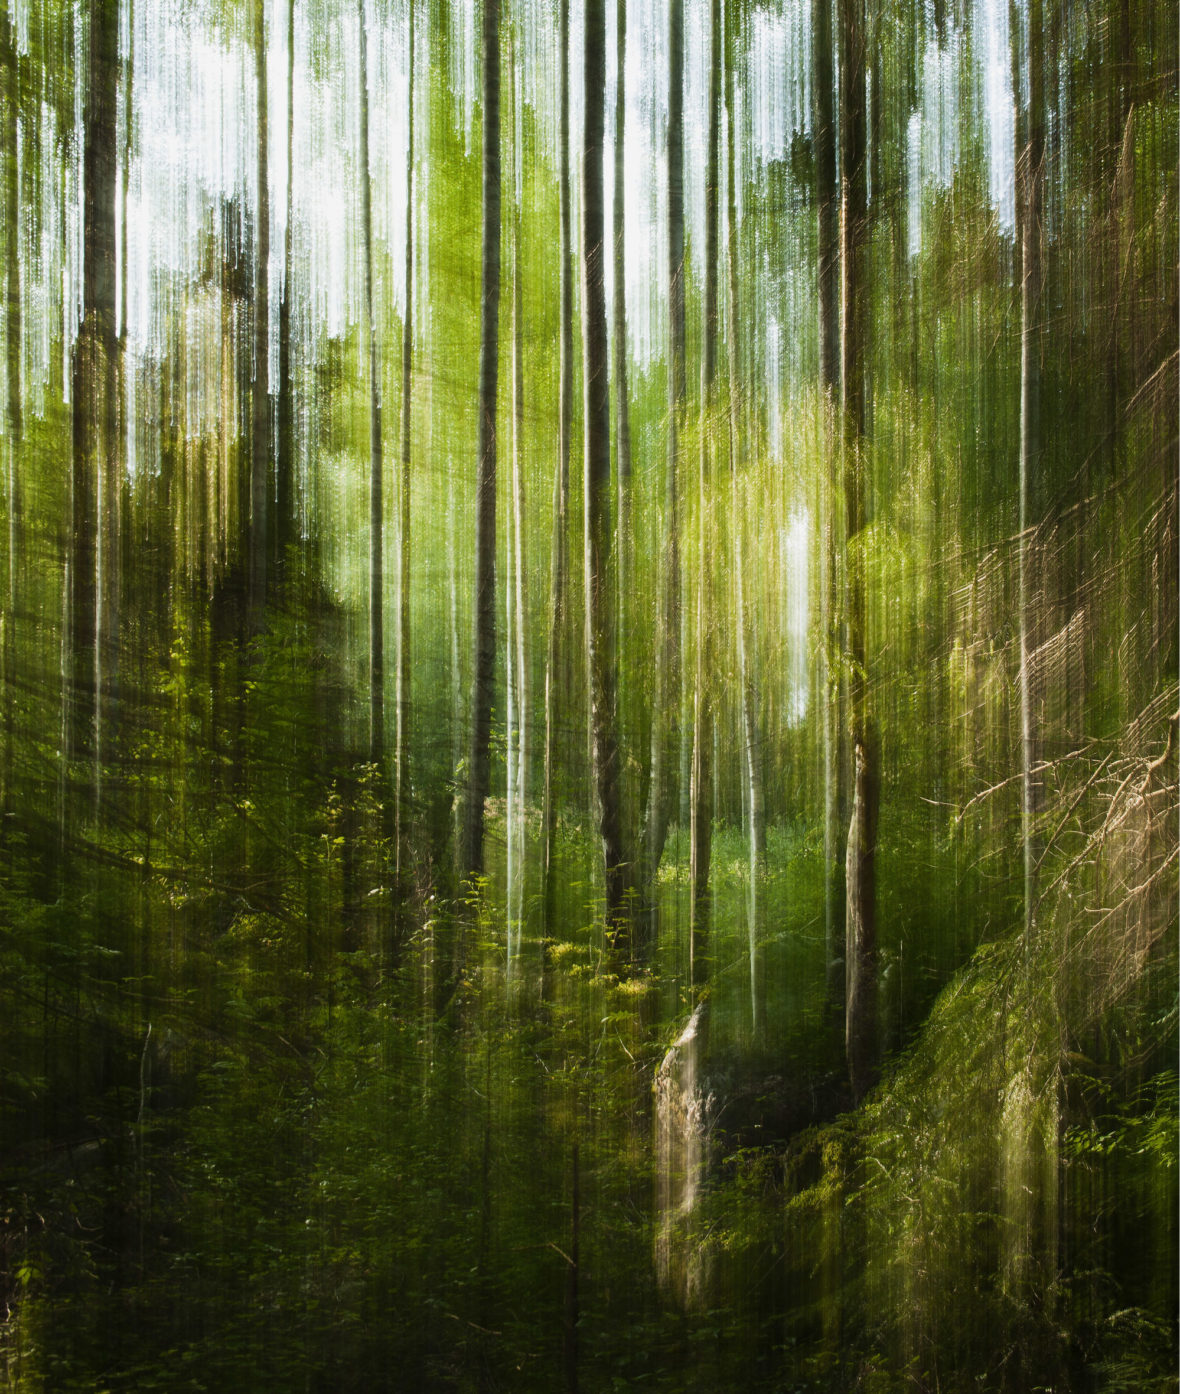 Metsämaisema / Forest Landscape